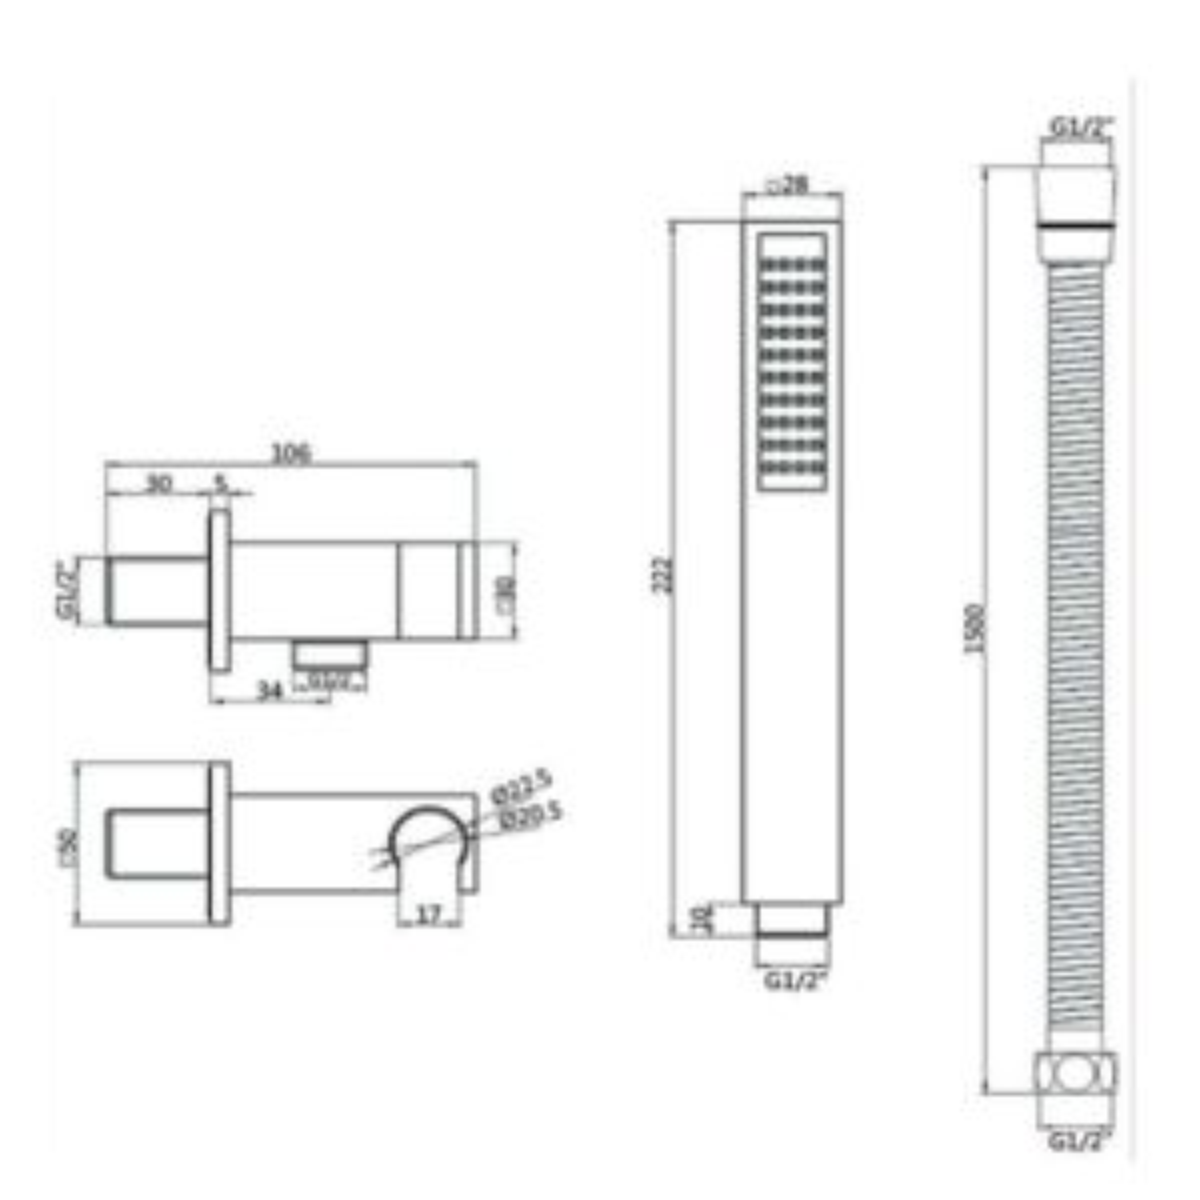 RAK Chrome Round Shower Handset with Bracket Kit Measurements